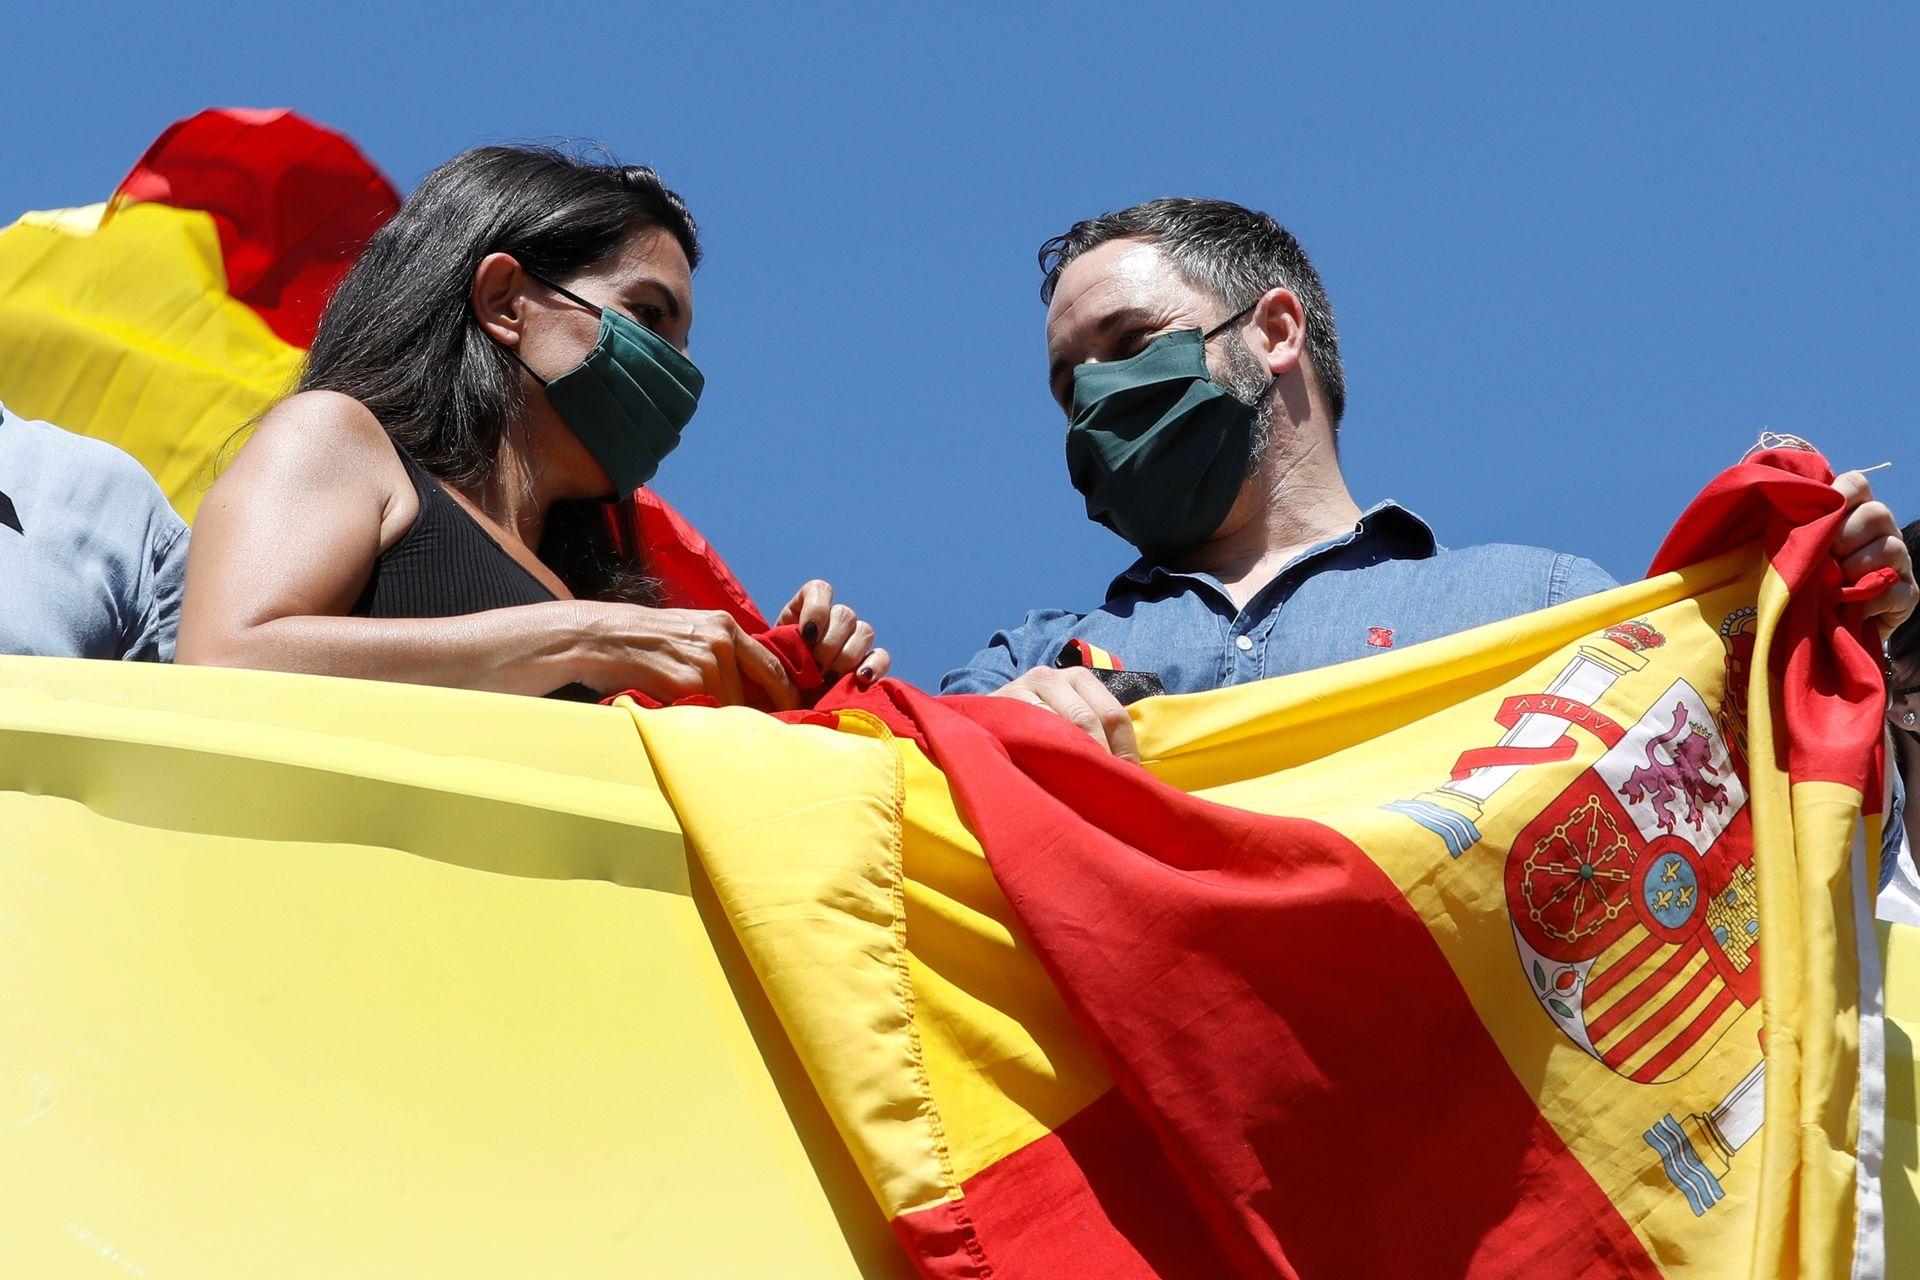 rocio-monasterio-santiago-abascal-vox-bandera-espana.jpg